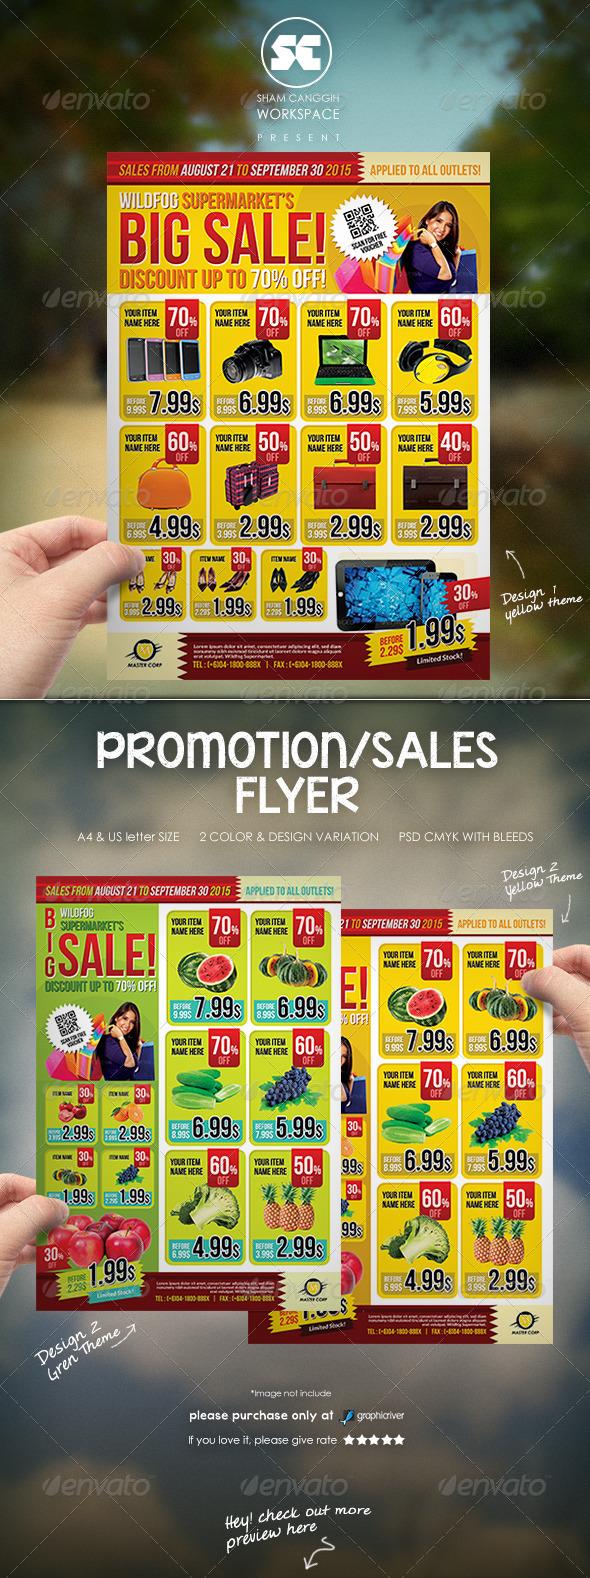 GraphicRiver Big Sale Promotion Flyer 7569215